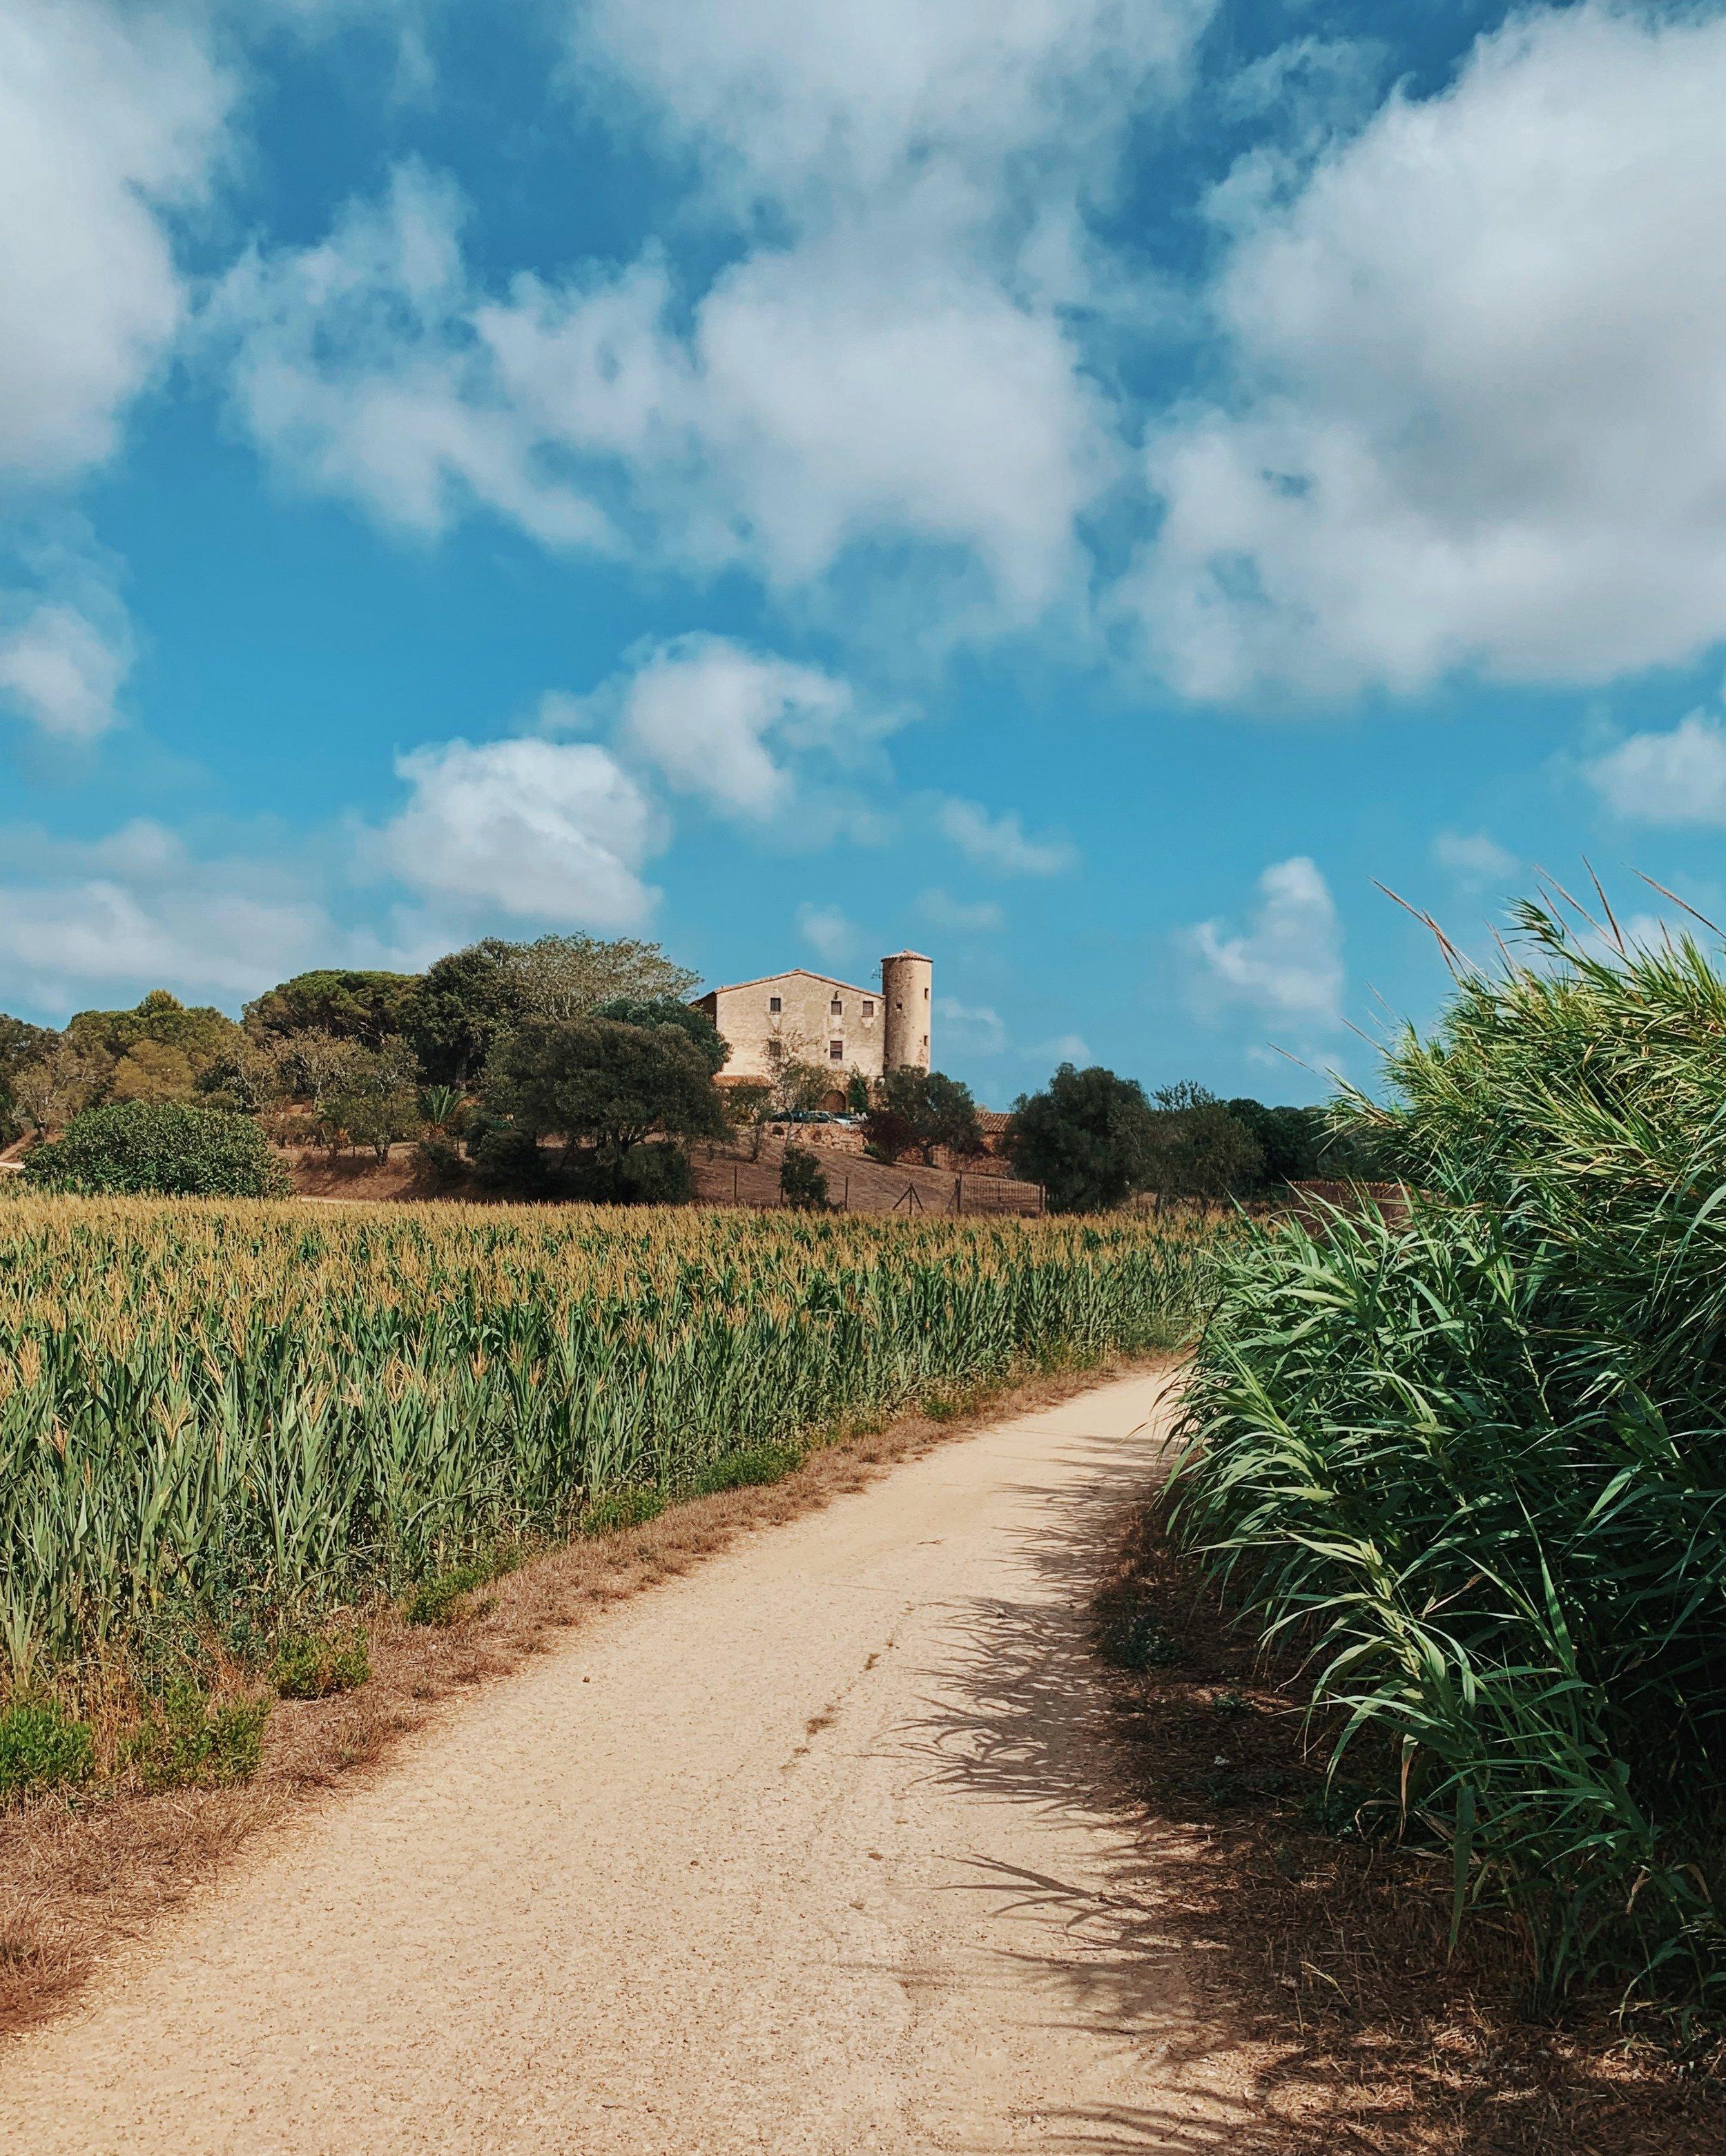 Road biking from Tossa de Mar to Llafranc